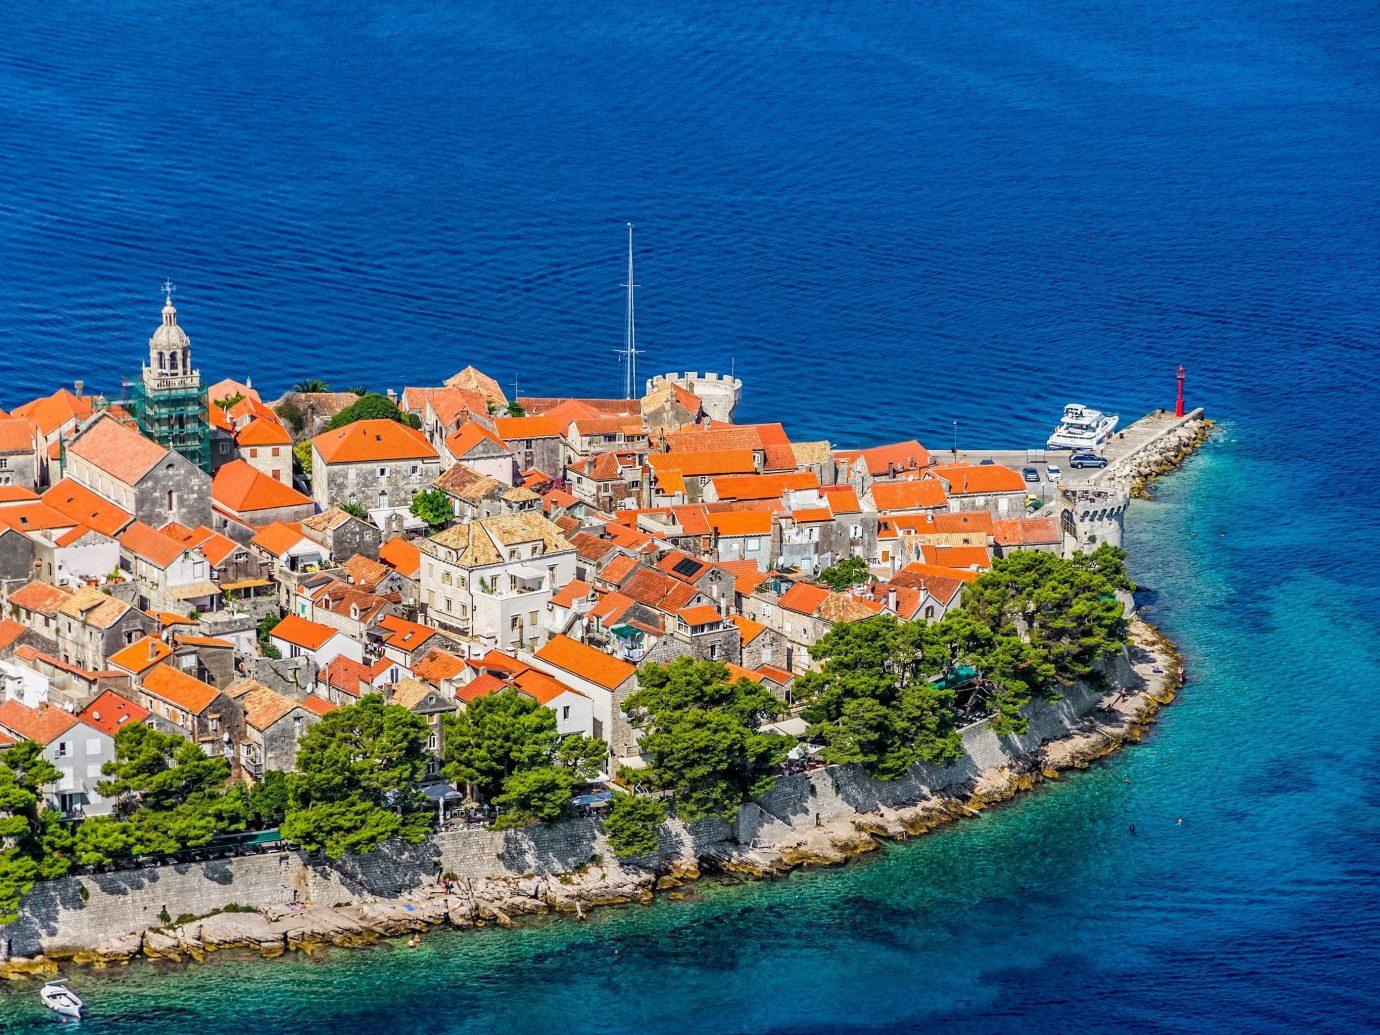 Secret Getaways Trip Ideas water Town Sea Coast orange vacation bay Harbor aerial photography cape Island cityscape Resort caribbean colored